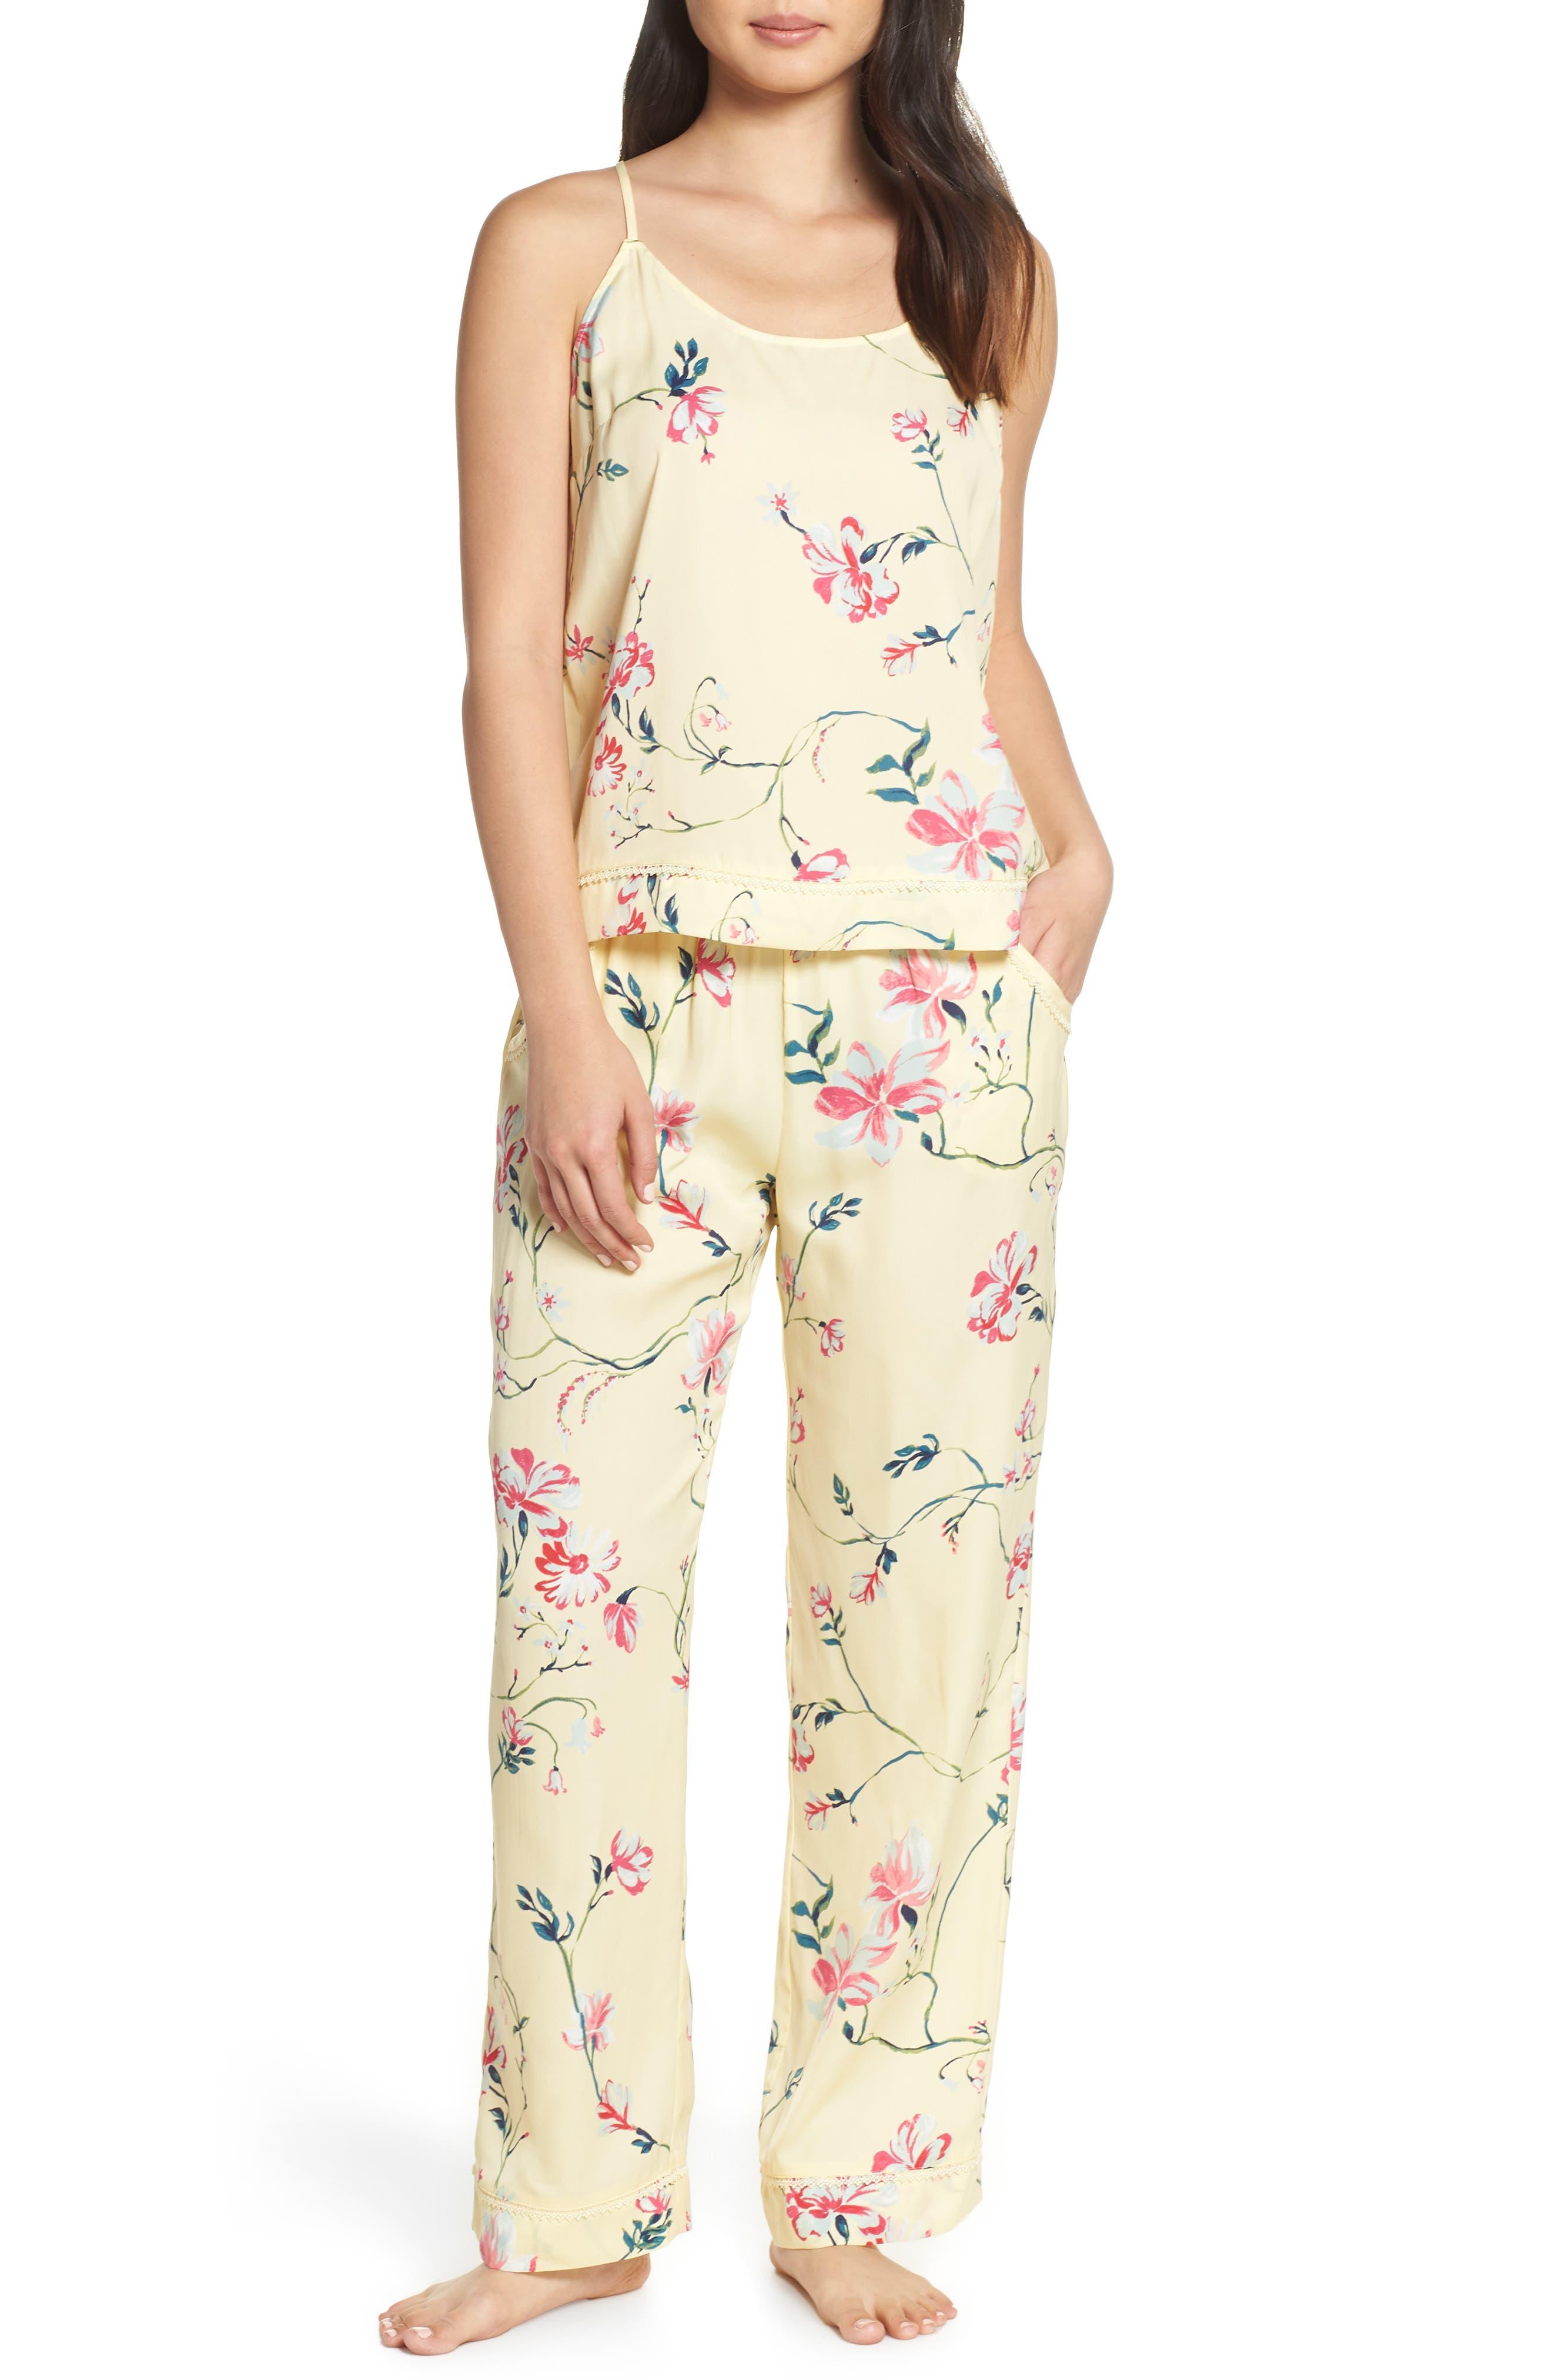 Nordstrom Lingerie Sweet Dreams Satin Pajamas, Yellow